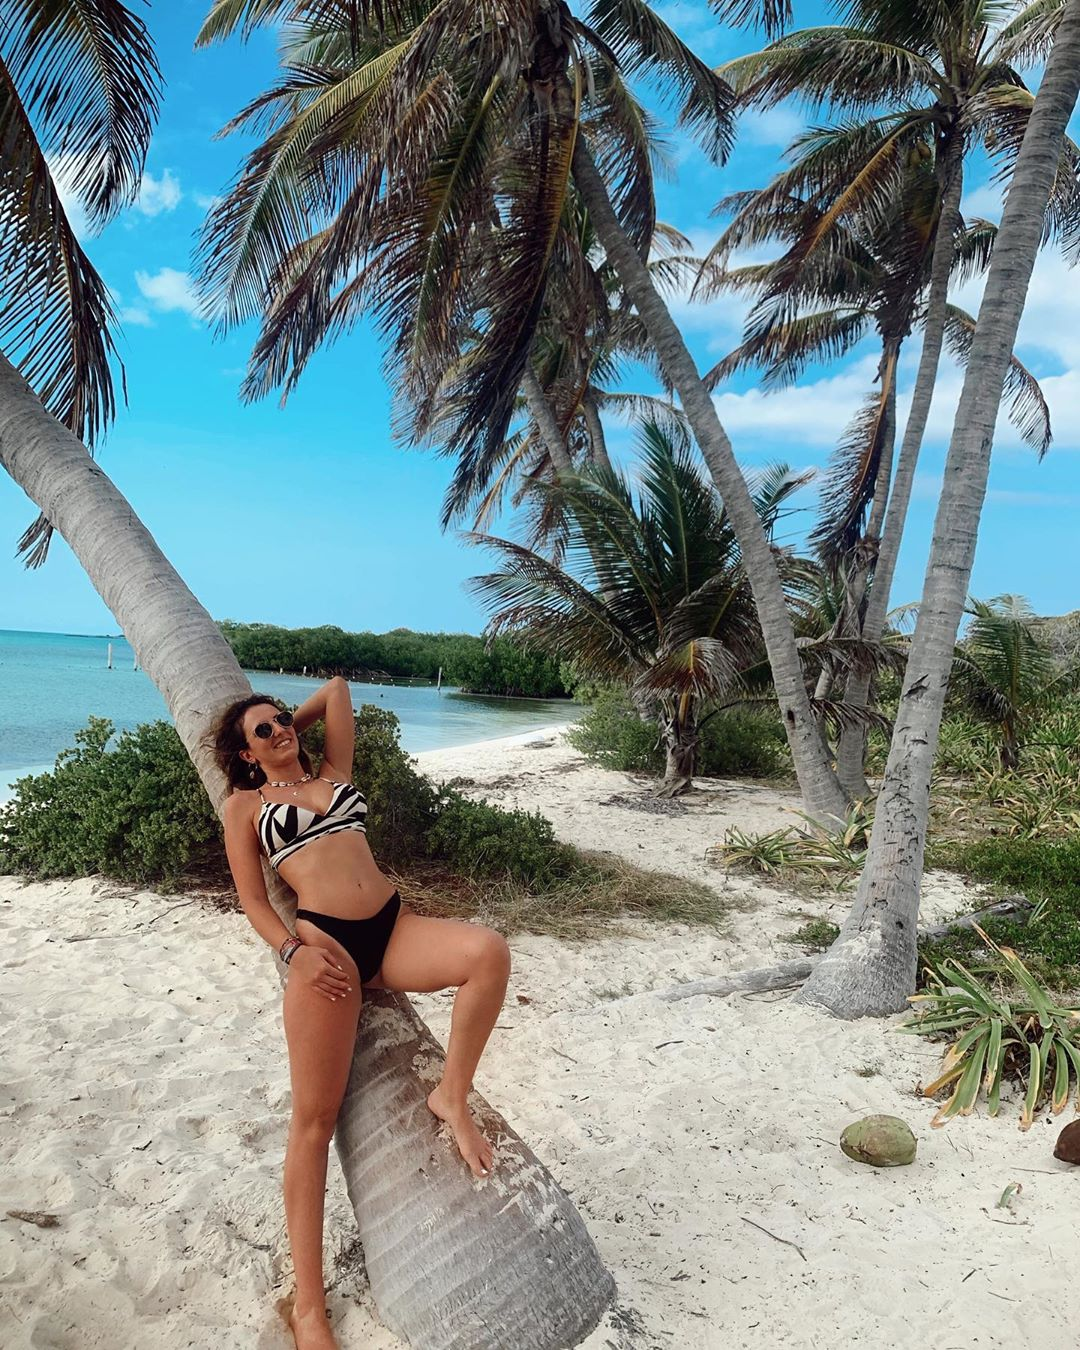 Isla Contoy, TOP yucatan, Contoy Island, the best of the yucatan peninsula